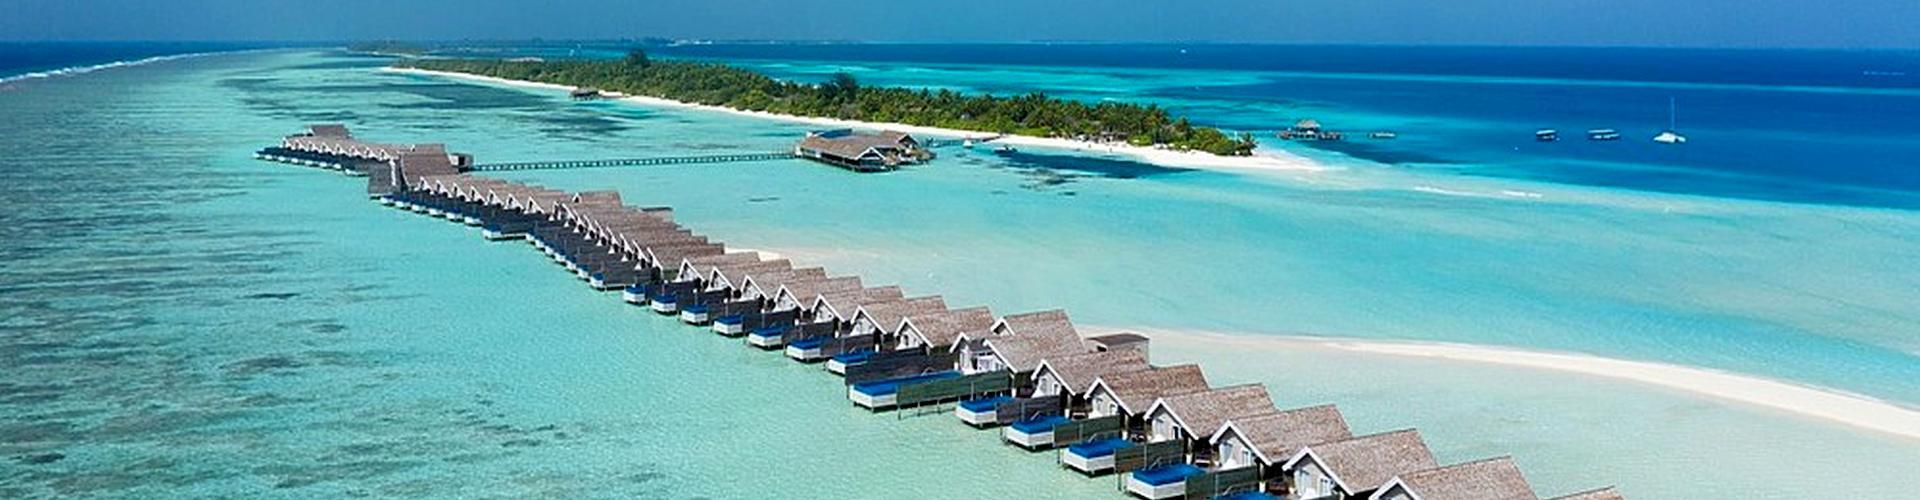 LUX* Hotel South Ari Atoll